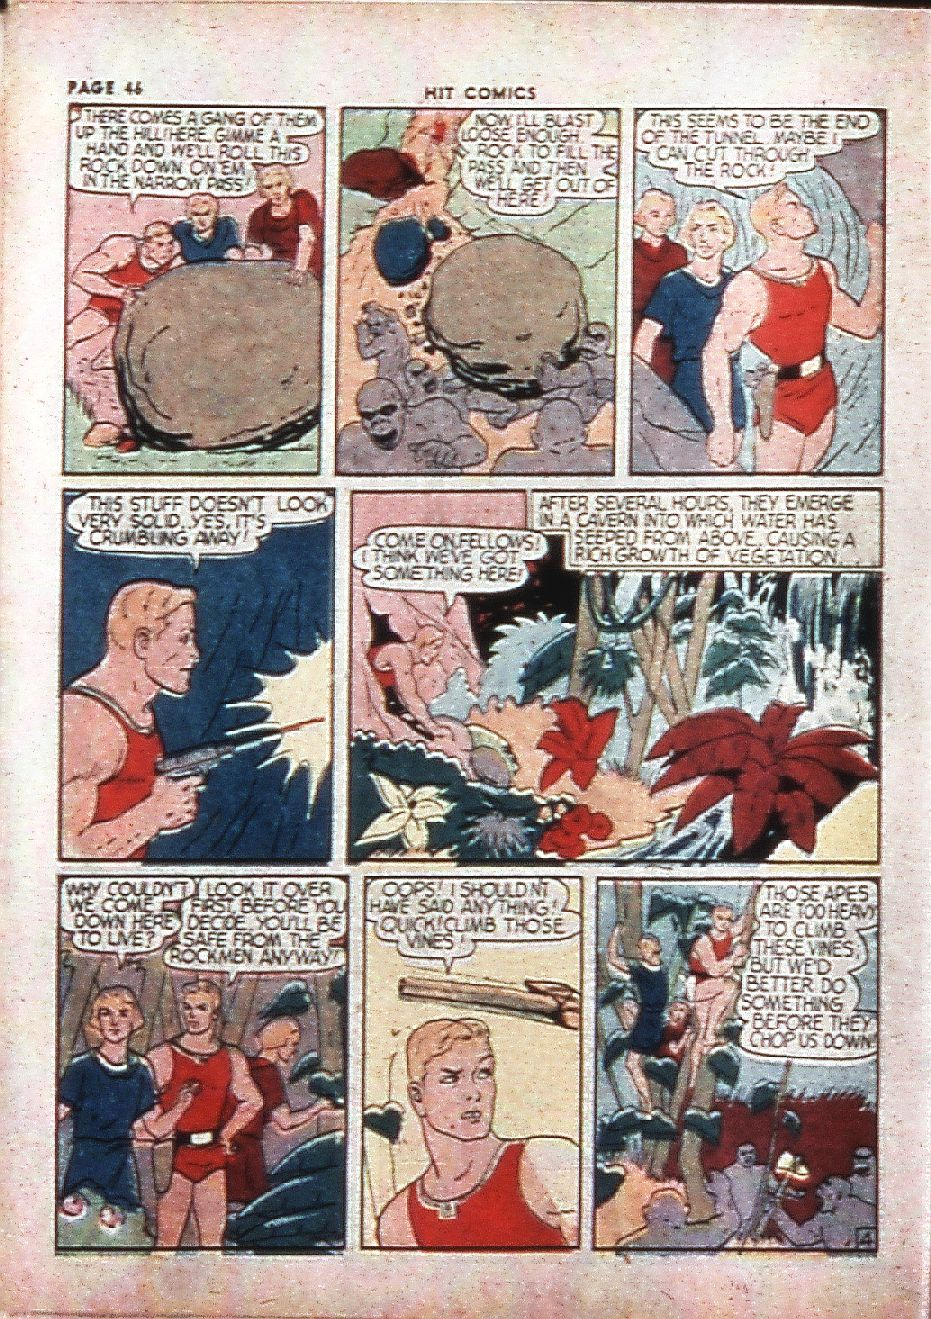 Read online Hit Comics comic -  Issue #4 - 48